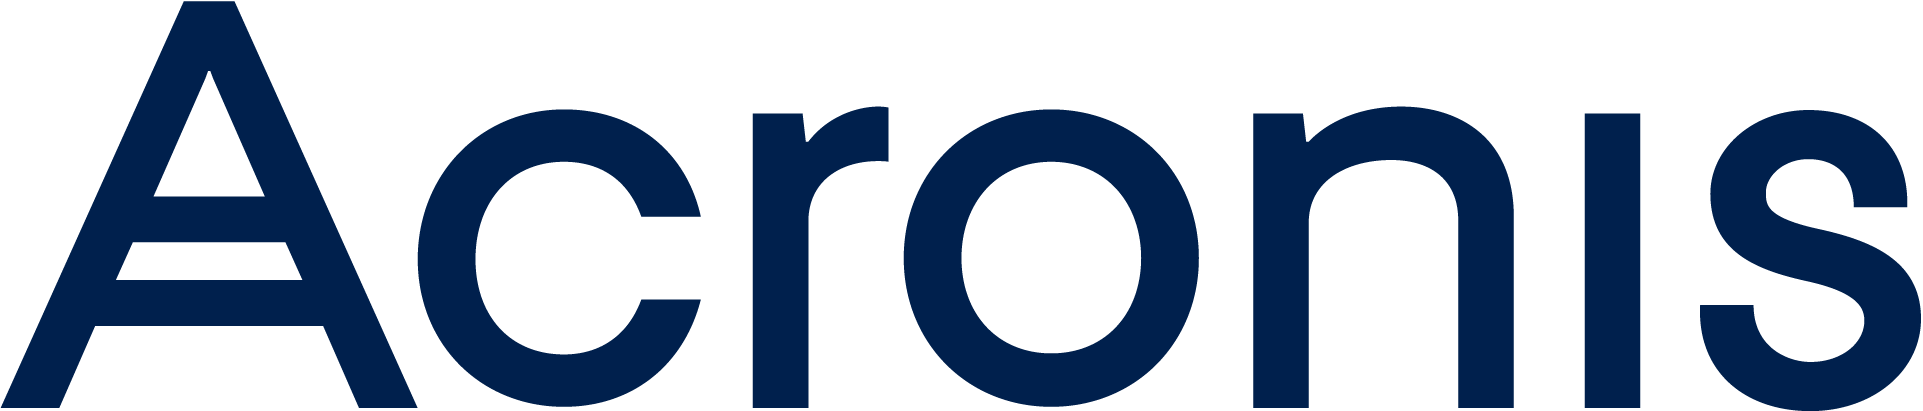 Acronis-logo-large.png